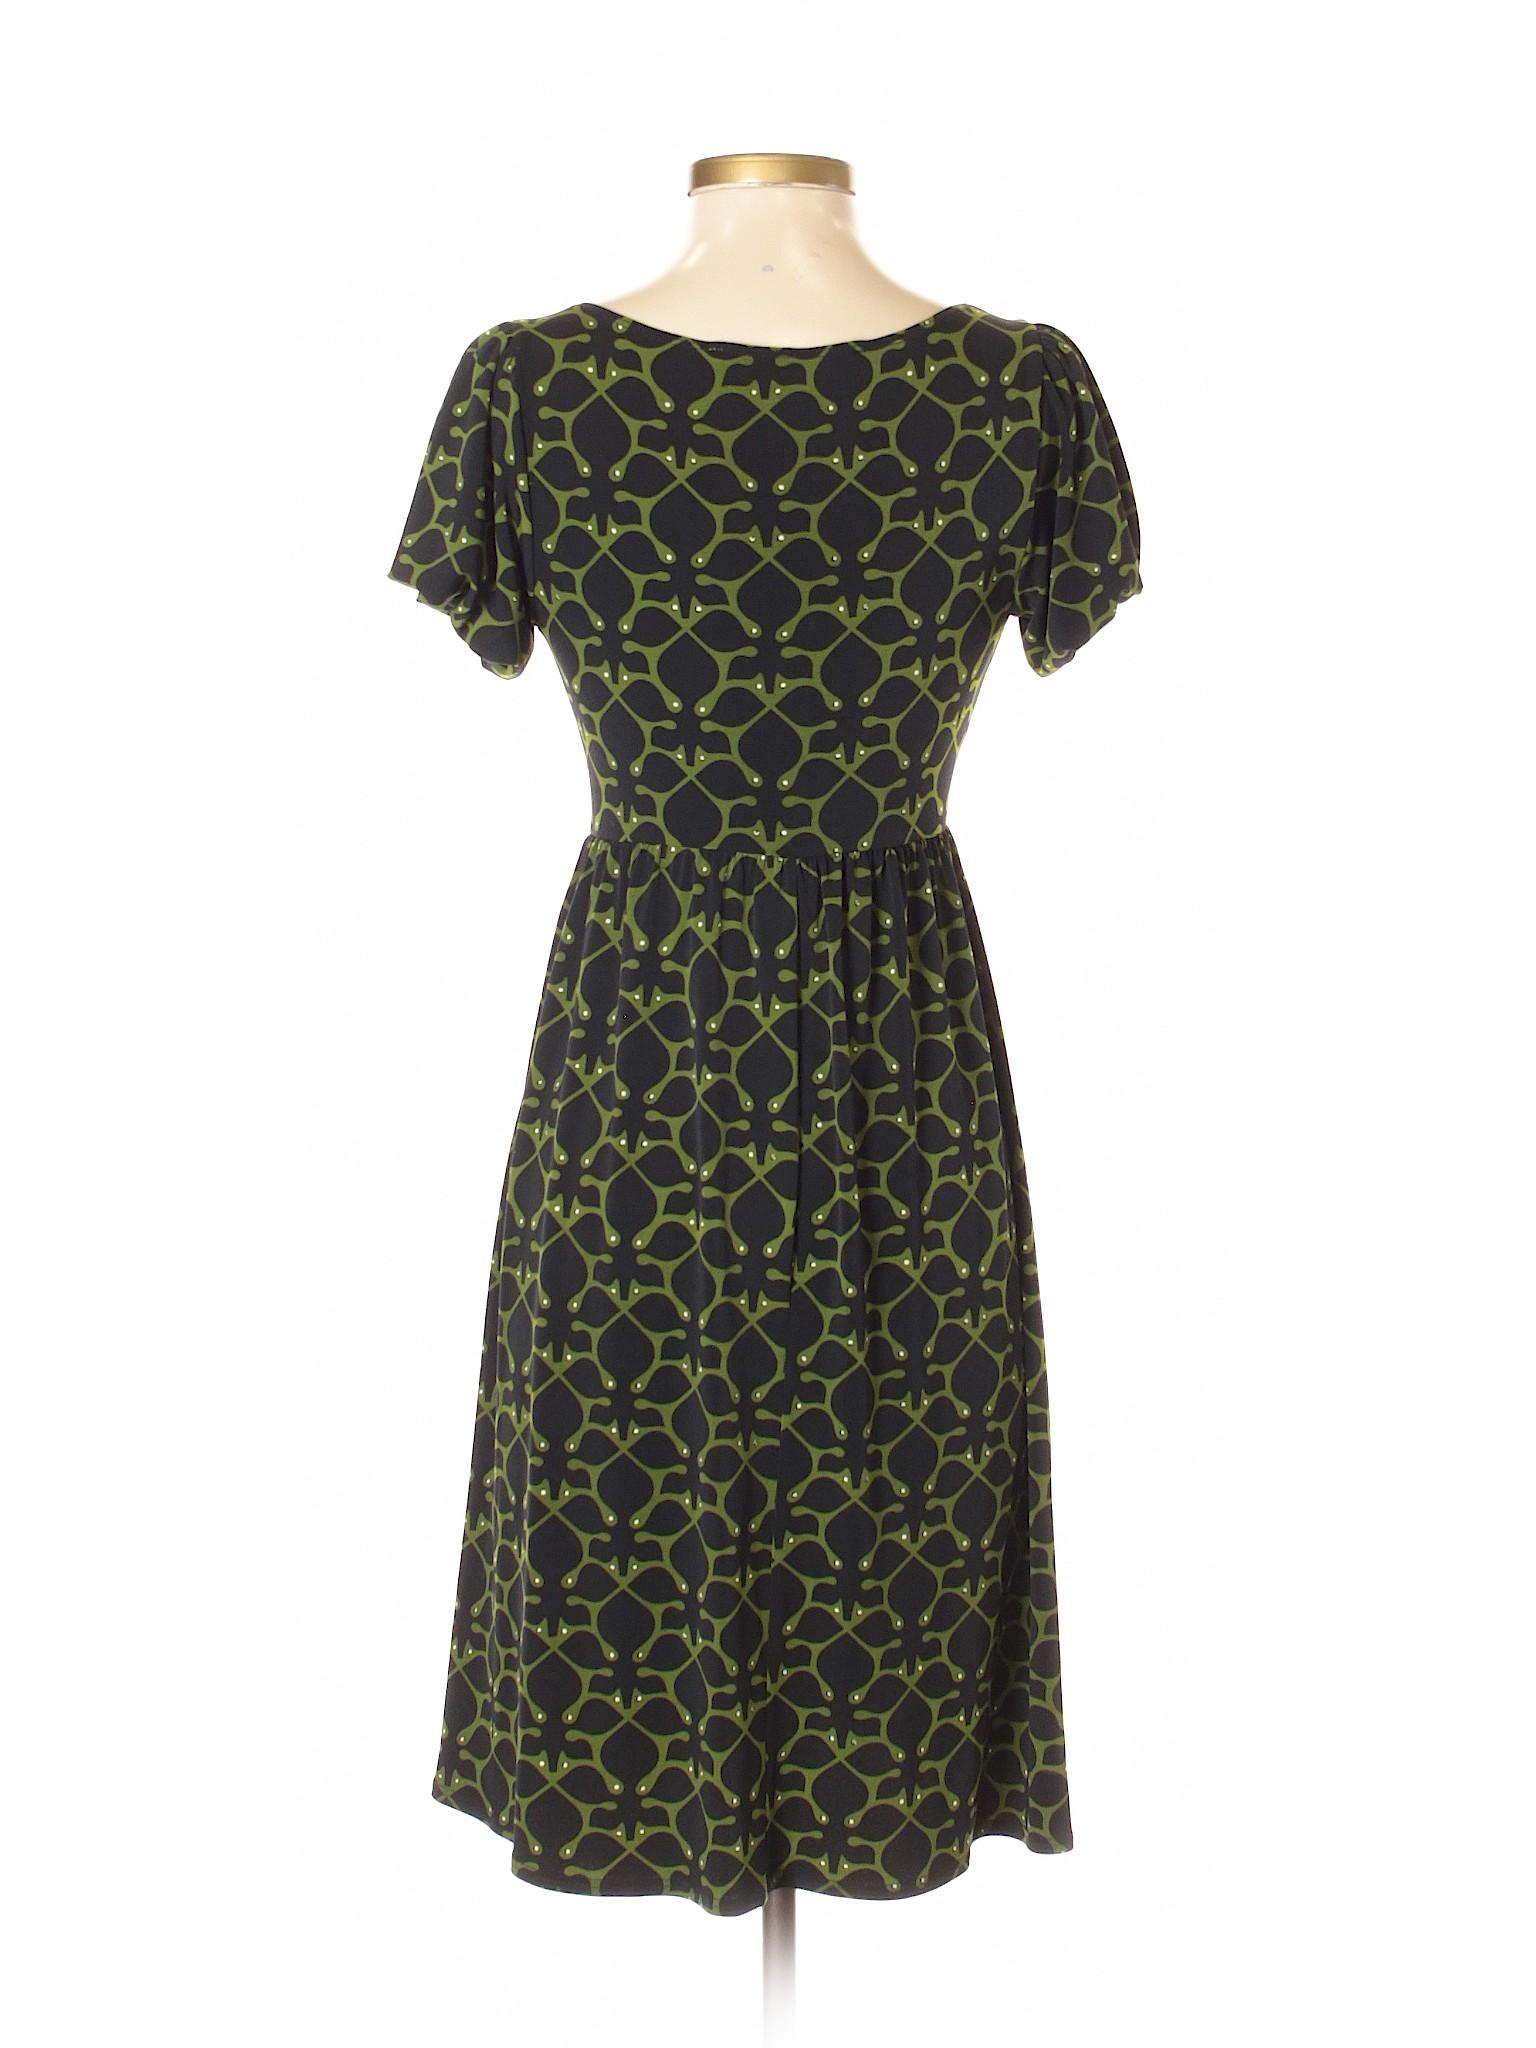 Max Casual Selling Selling Max Studio Dress EZWZ0vqS